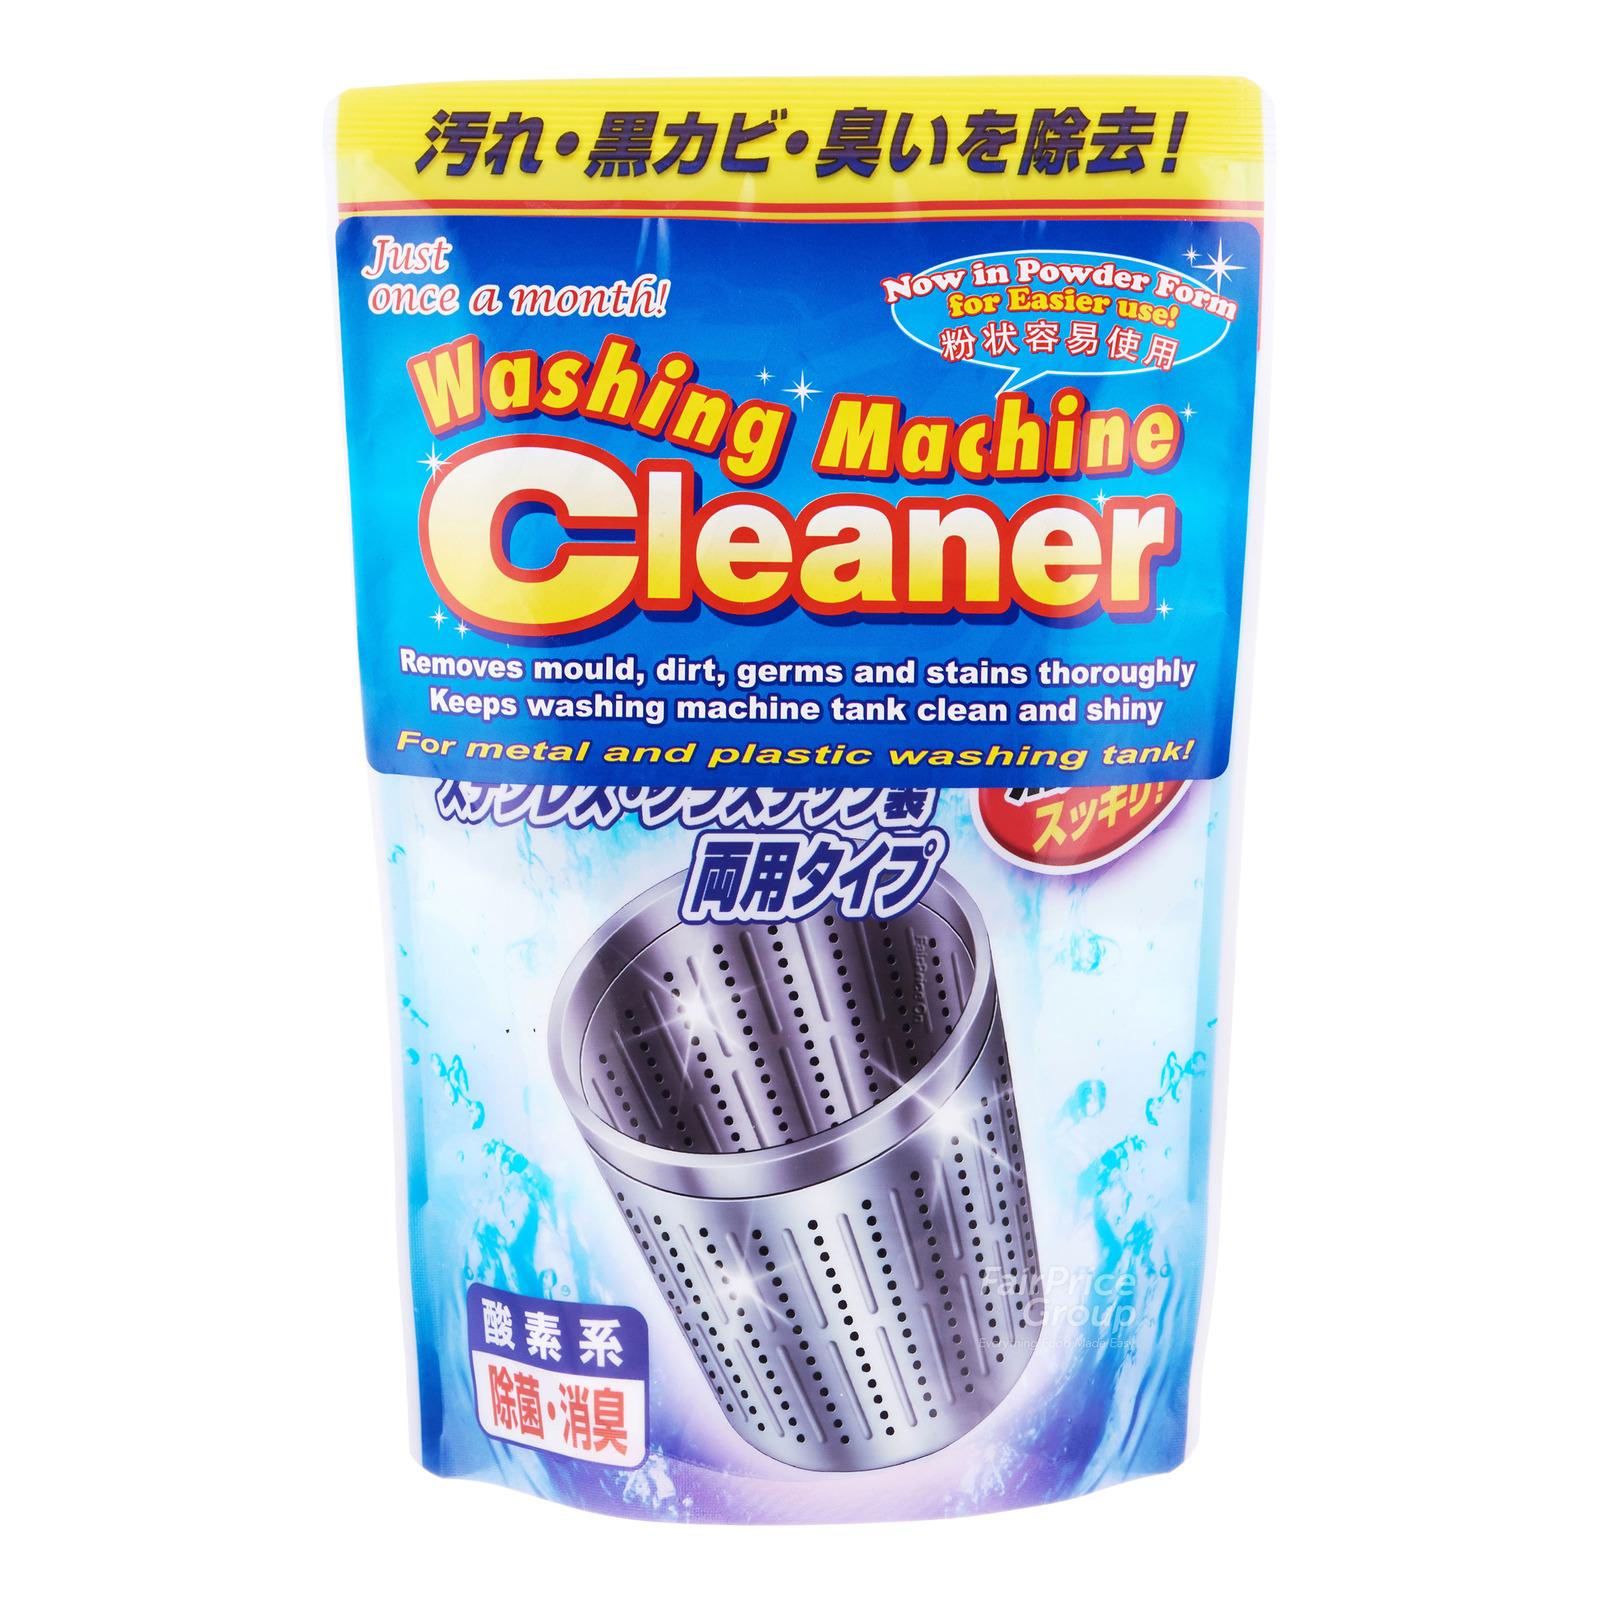 Nichigo Washing Machine Cleaner